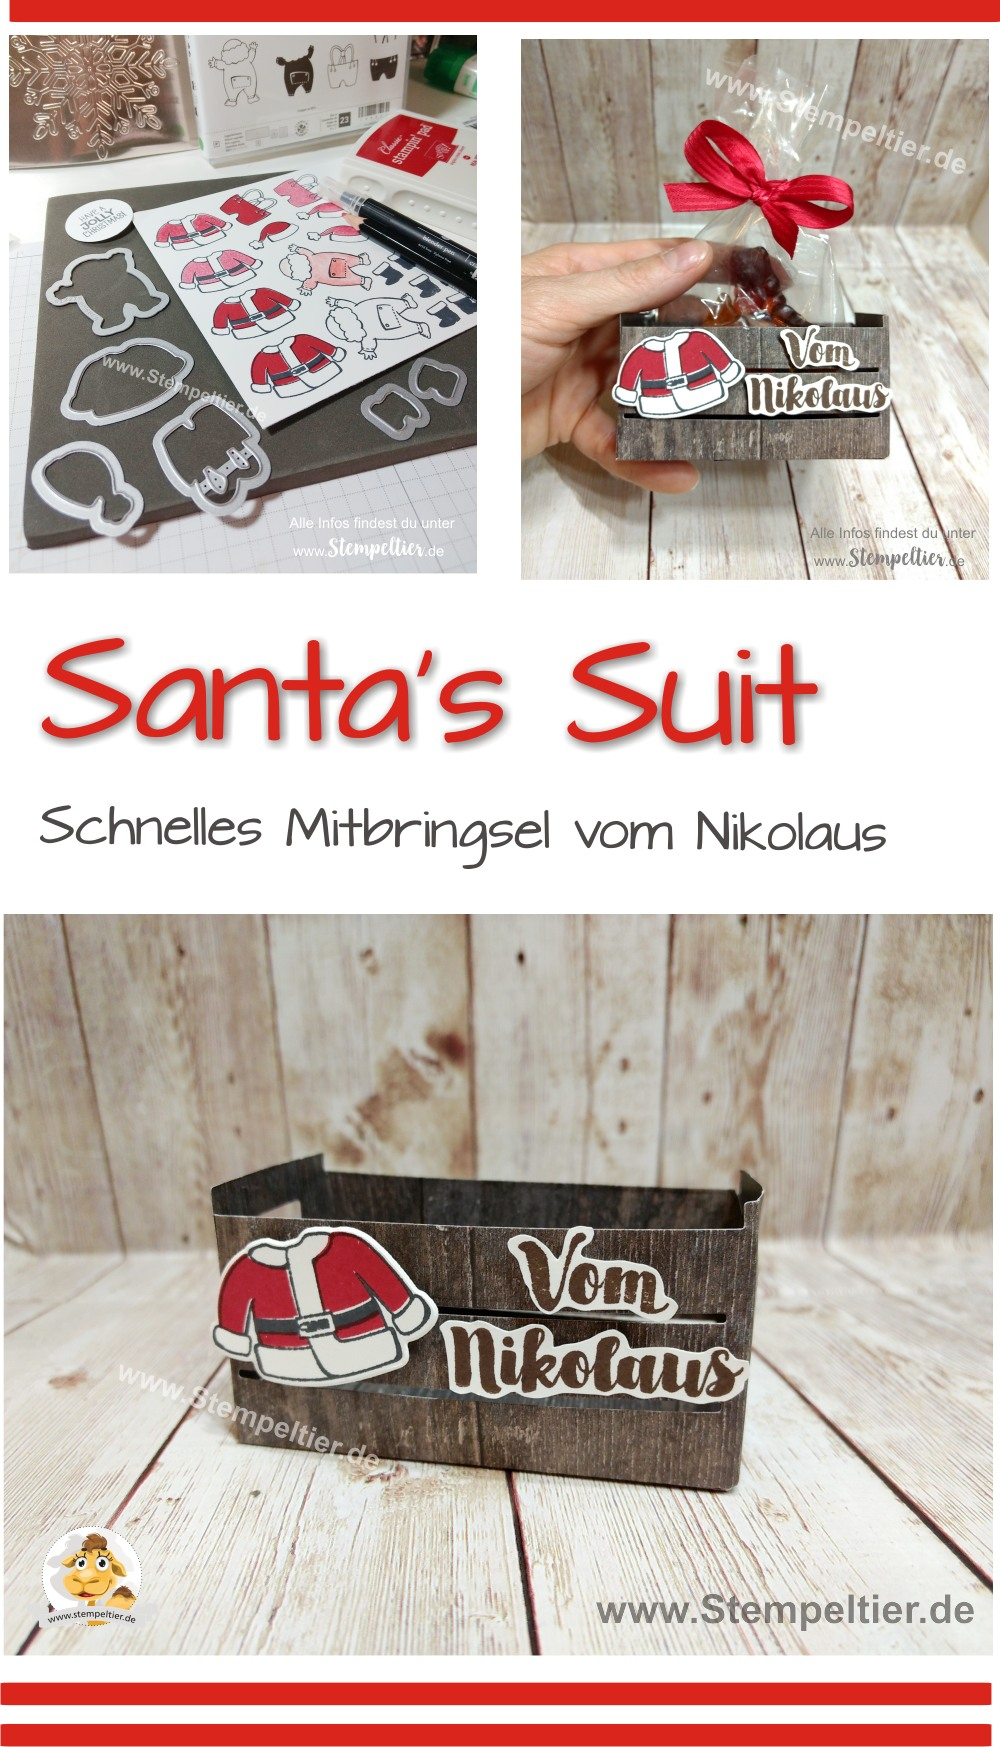 stampin up blog santas suit weihnachtsmann builder nikolaus obstkiste verpackung santa clause goodie mitbringsel stempeltier